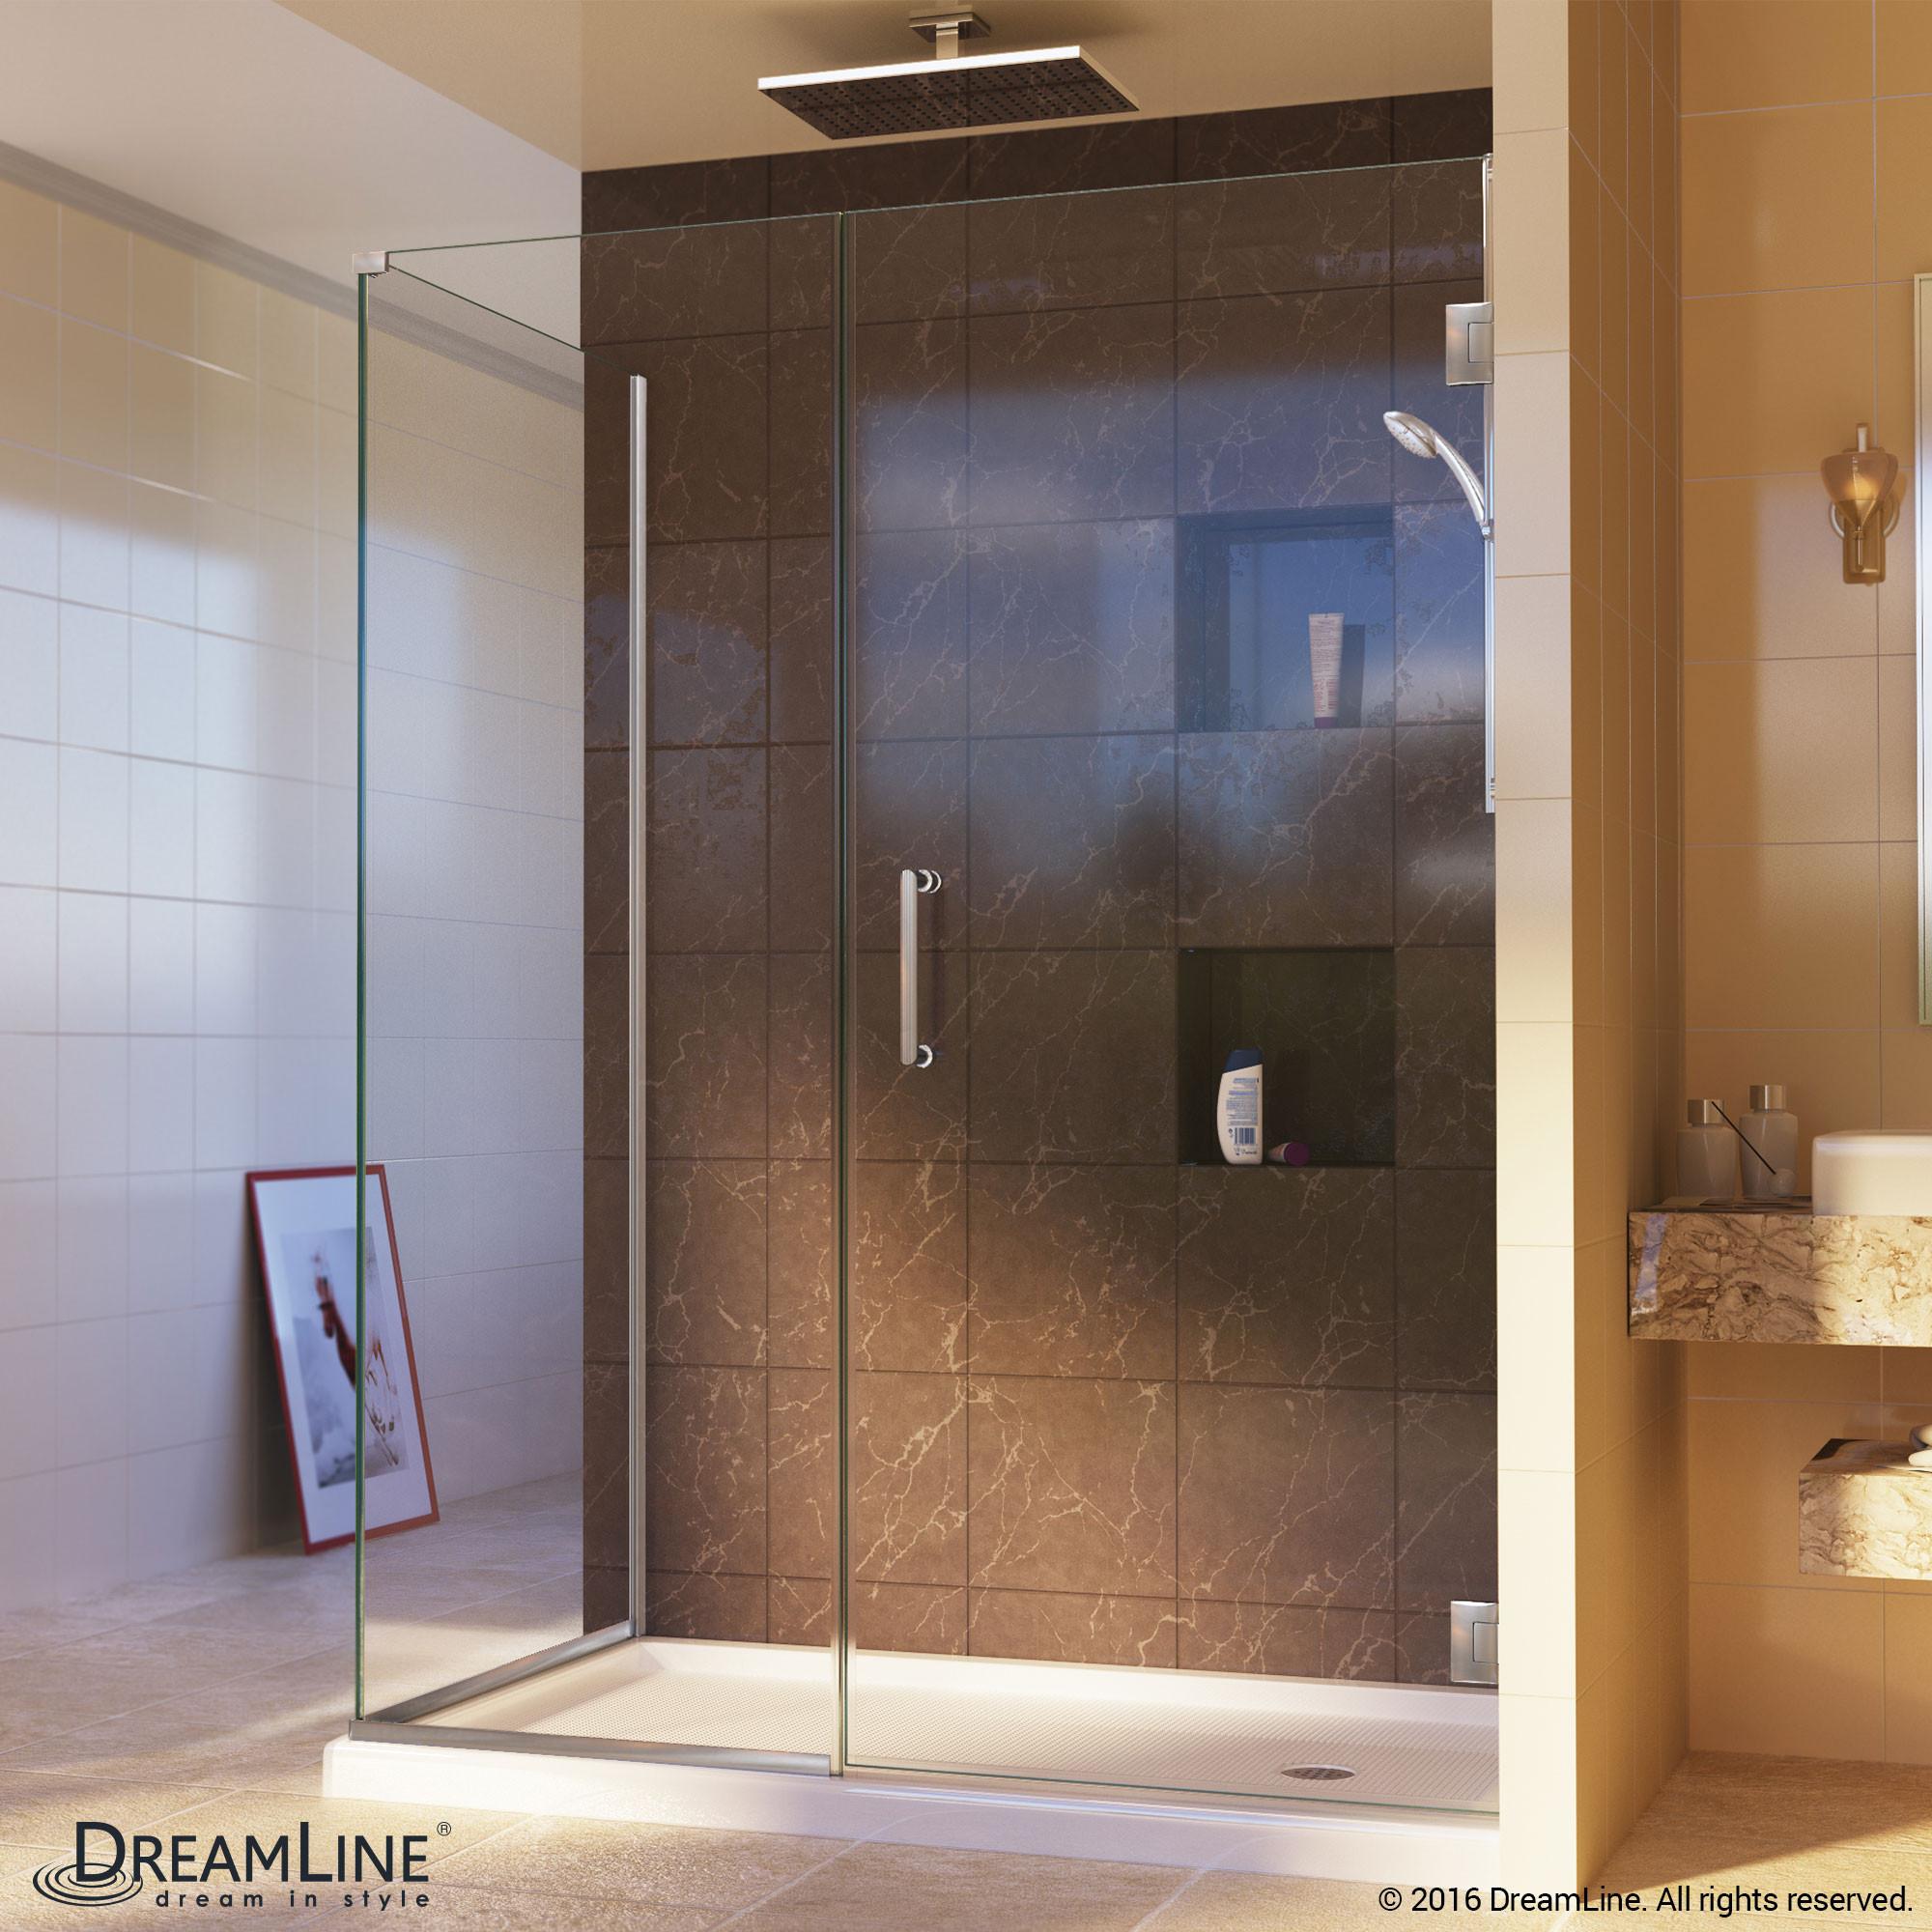 DreamLine SHEN-24425300-04 Unidoor Plus Hinged Shower Enclosure In Brushed Nickel Finish Hardware